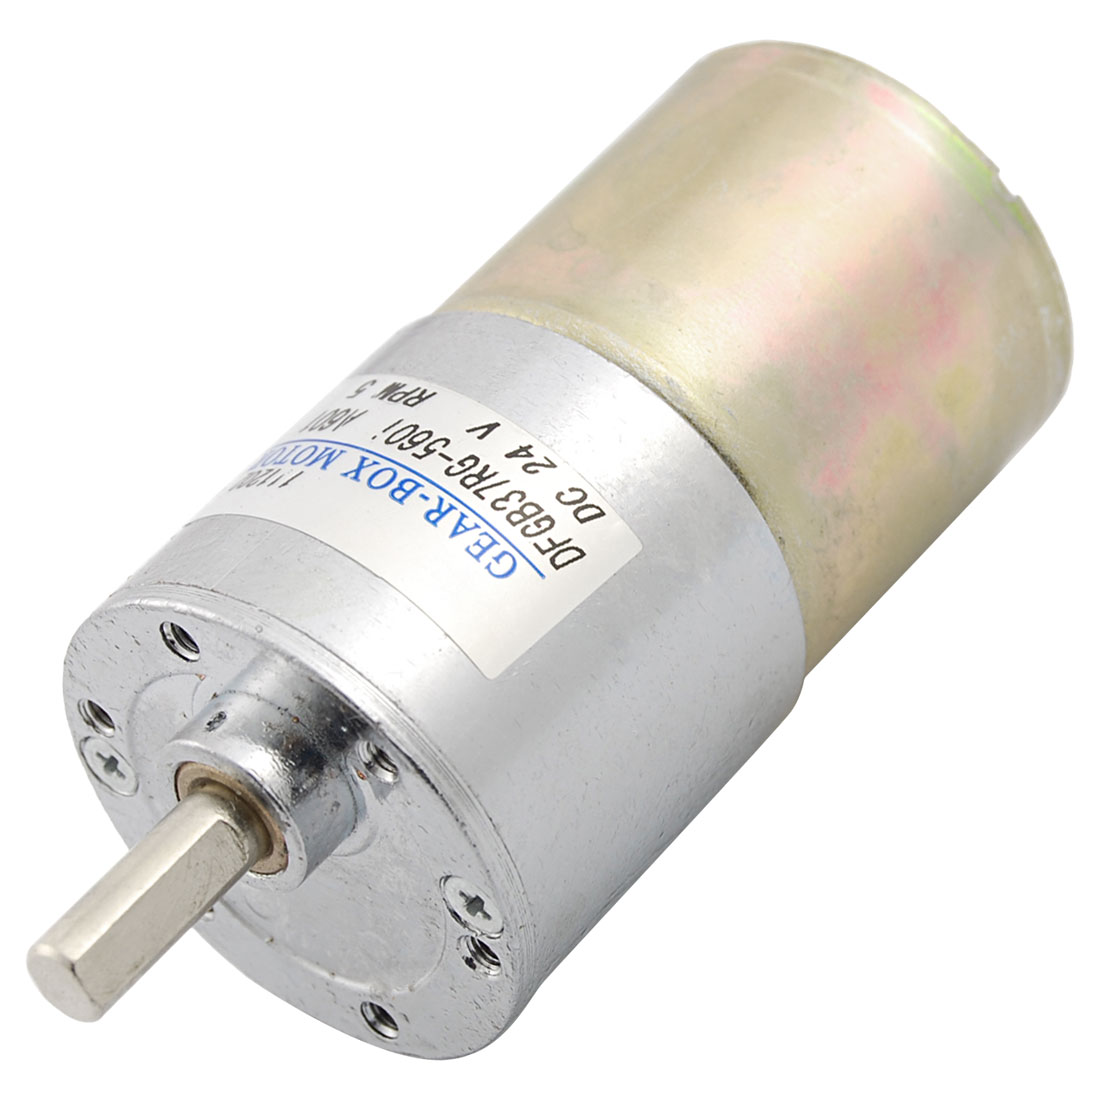 26kg.cm Torque 37mm Dia Magnetic Gear Box Motor 5 RPM 130mA 24V DC